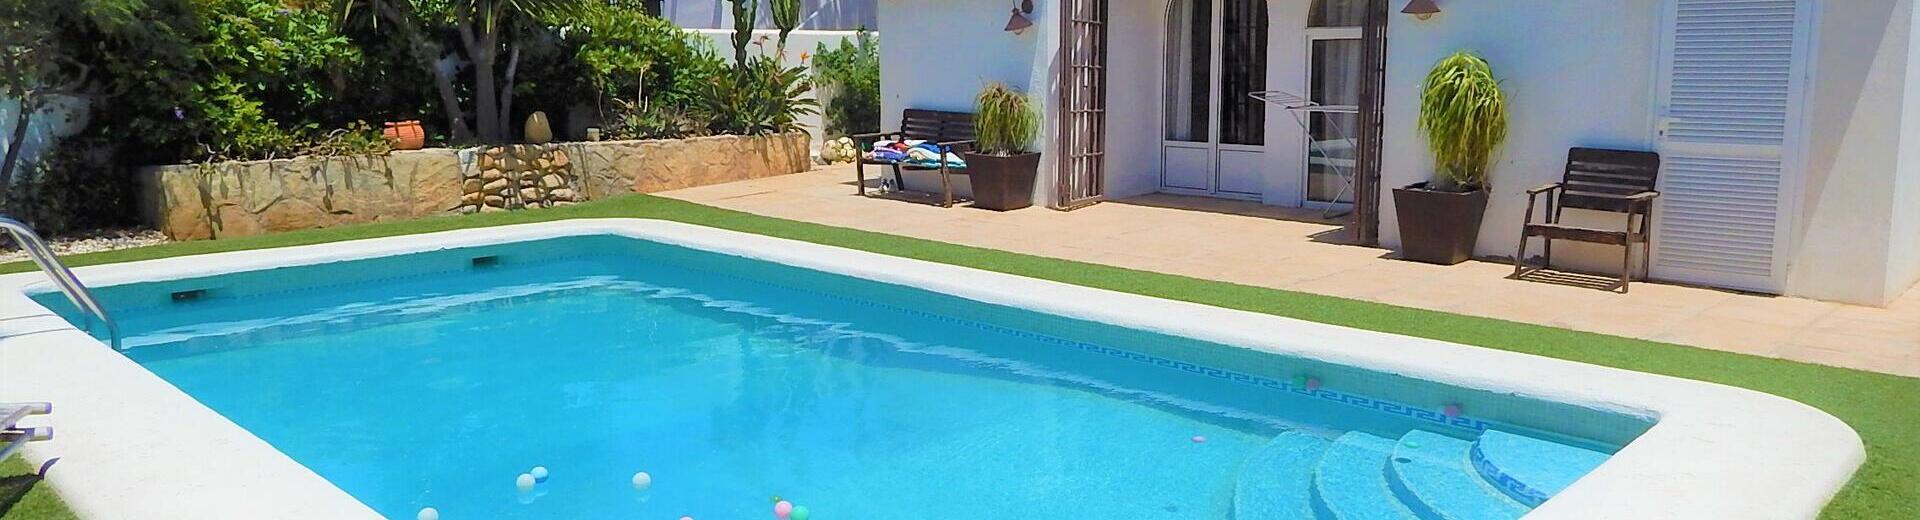 VIP7832: Villa à vendre